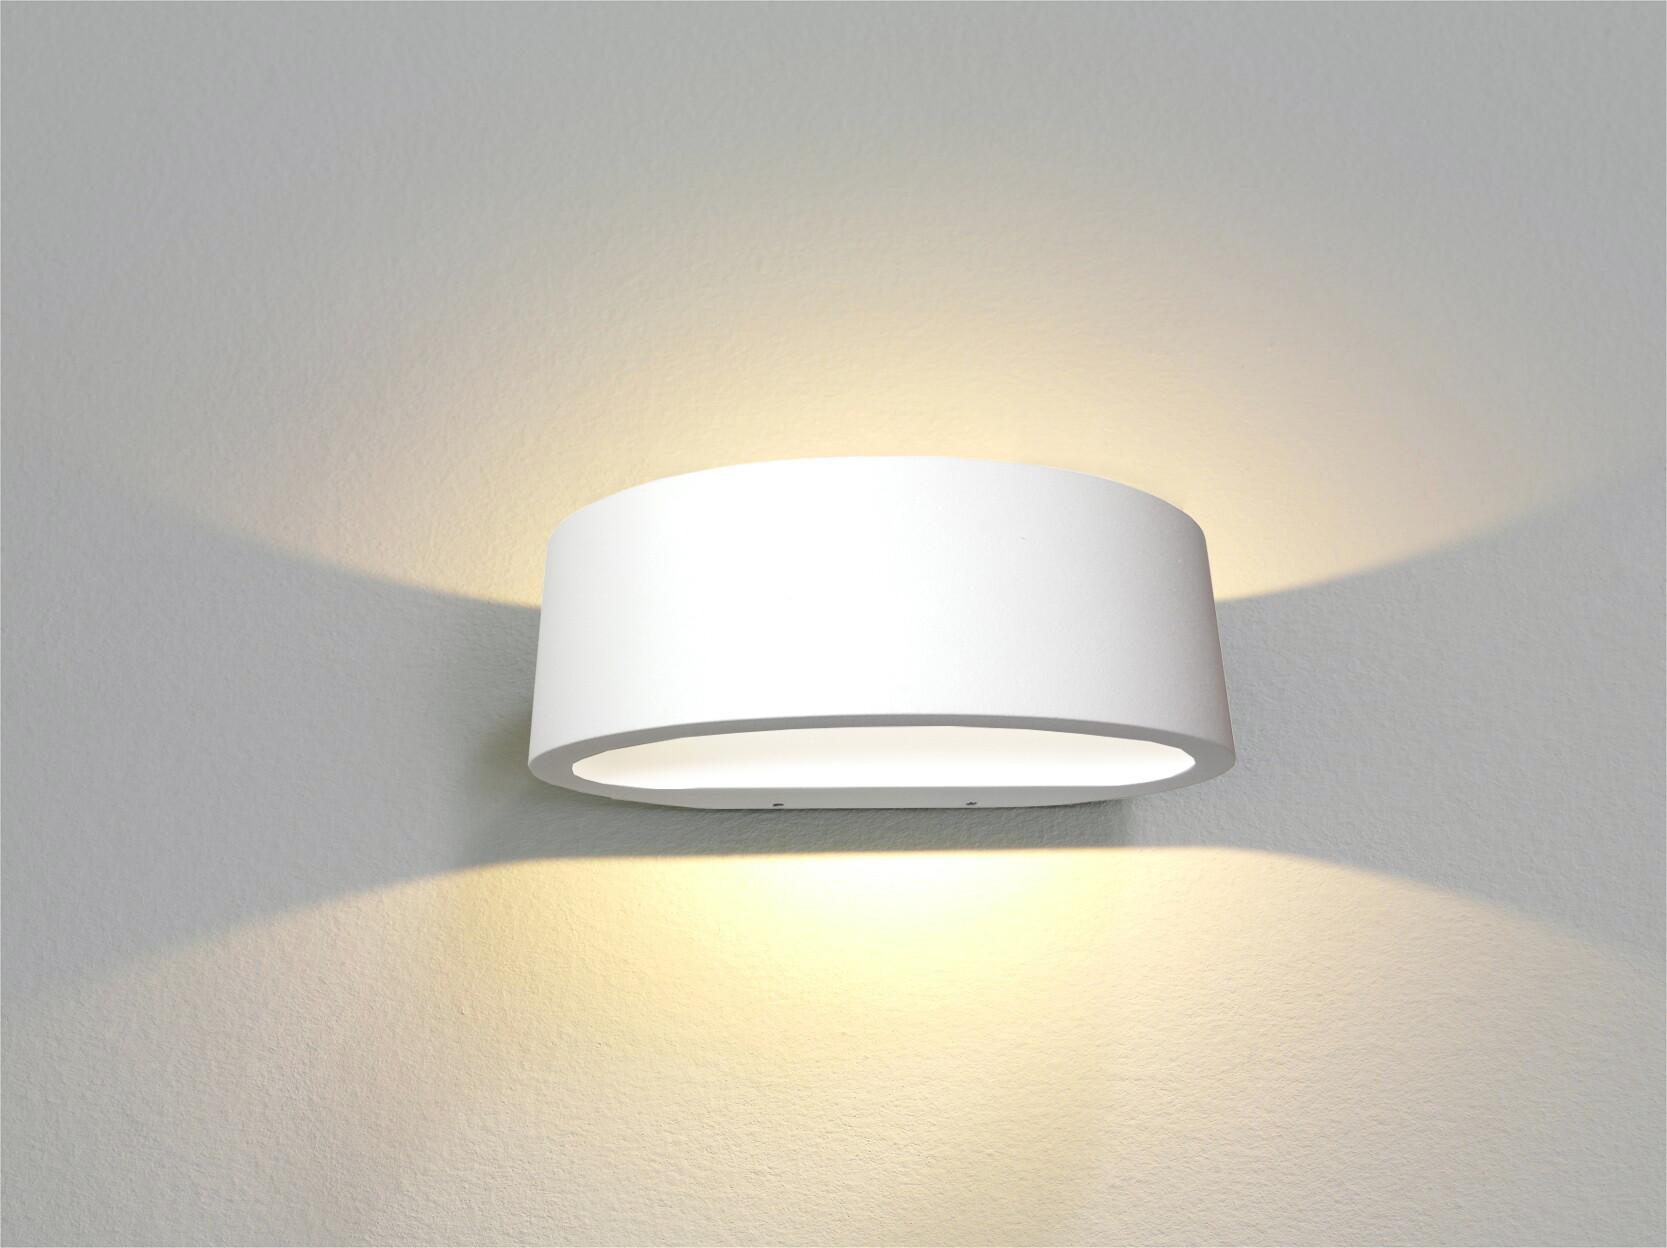 SHARP wandlampen